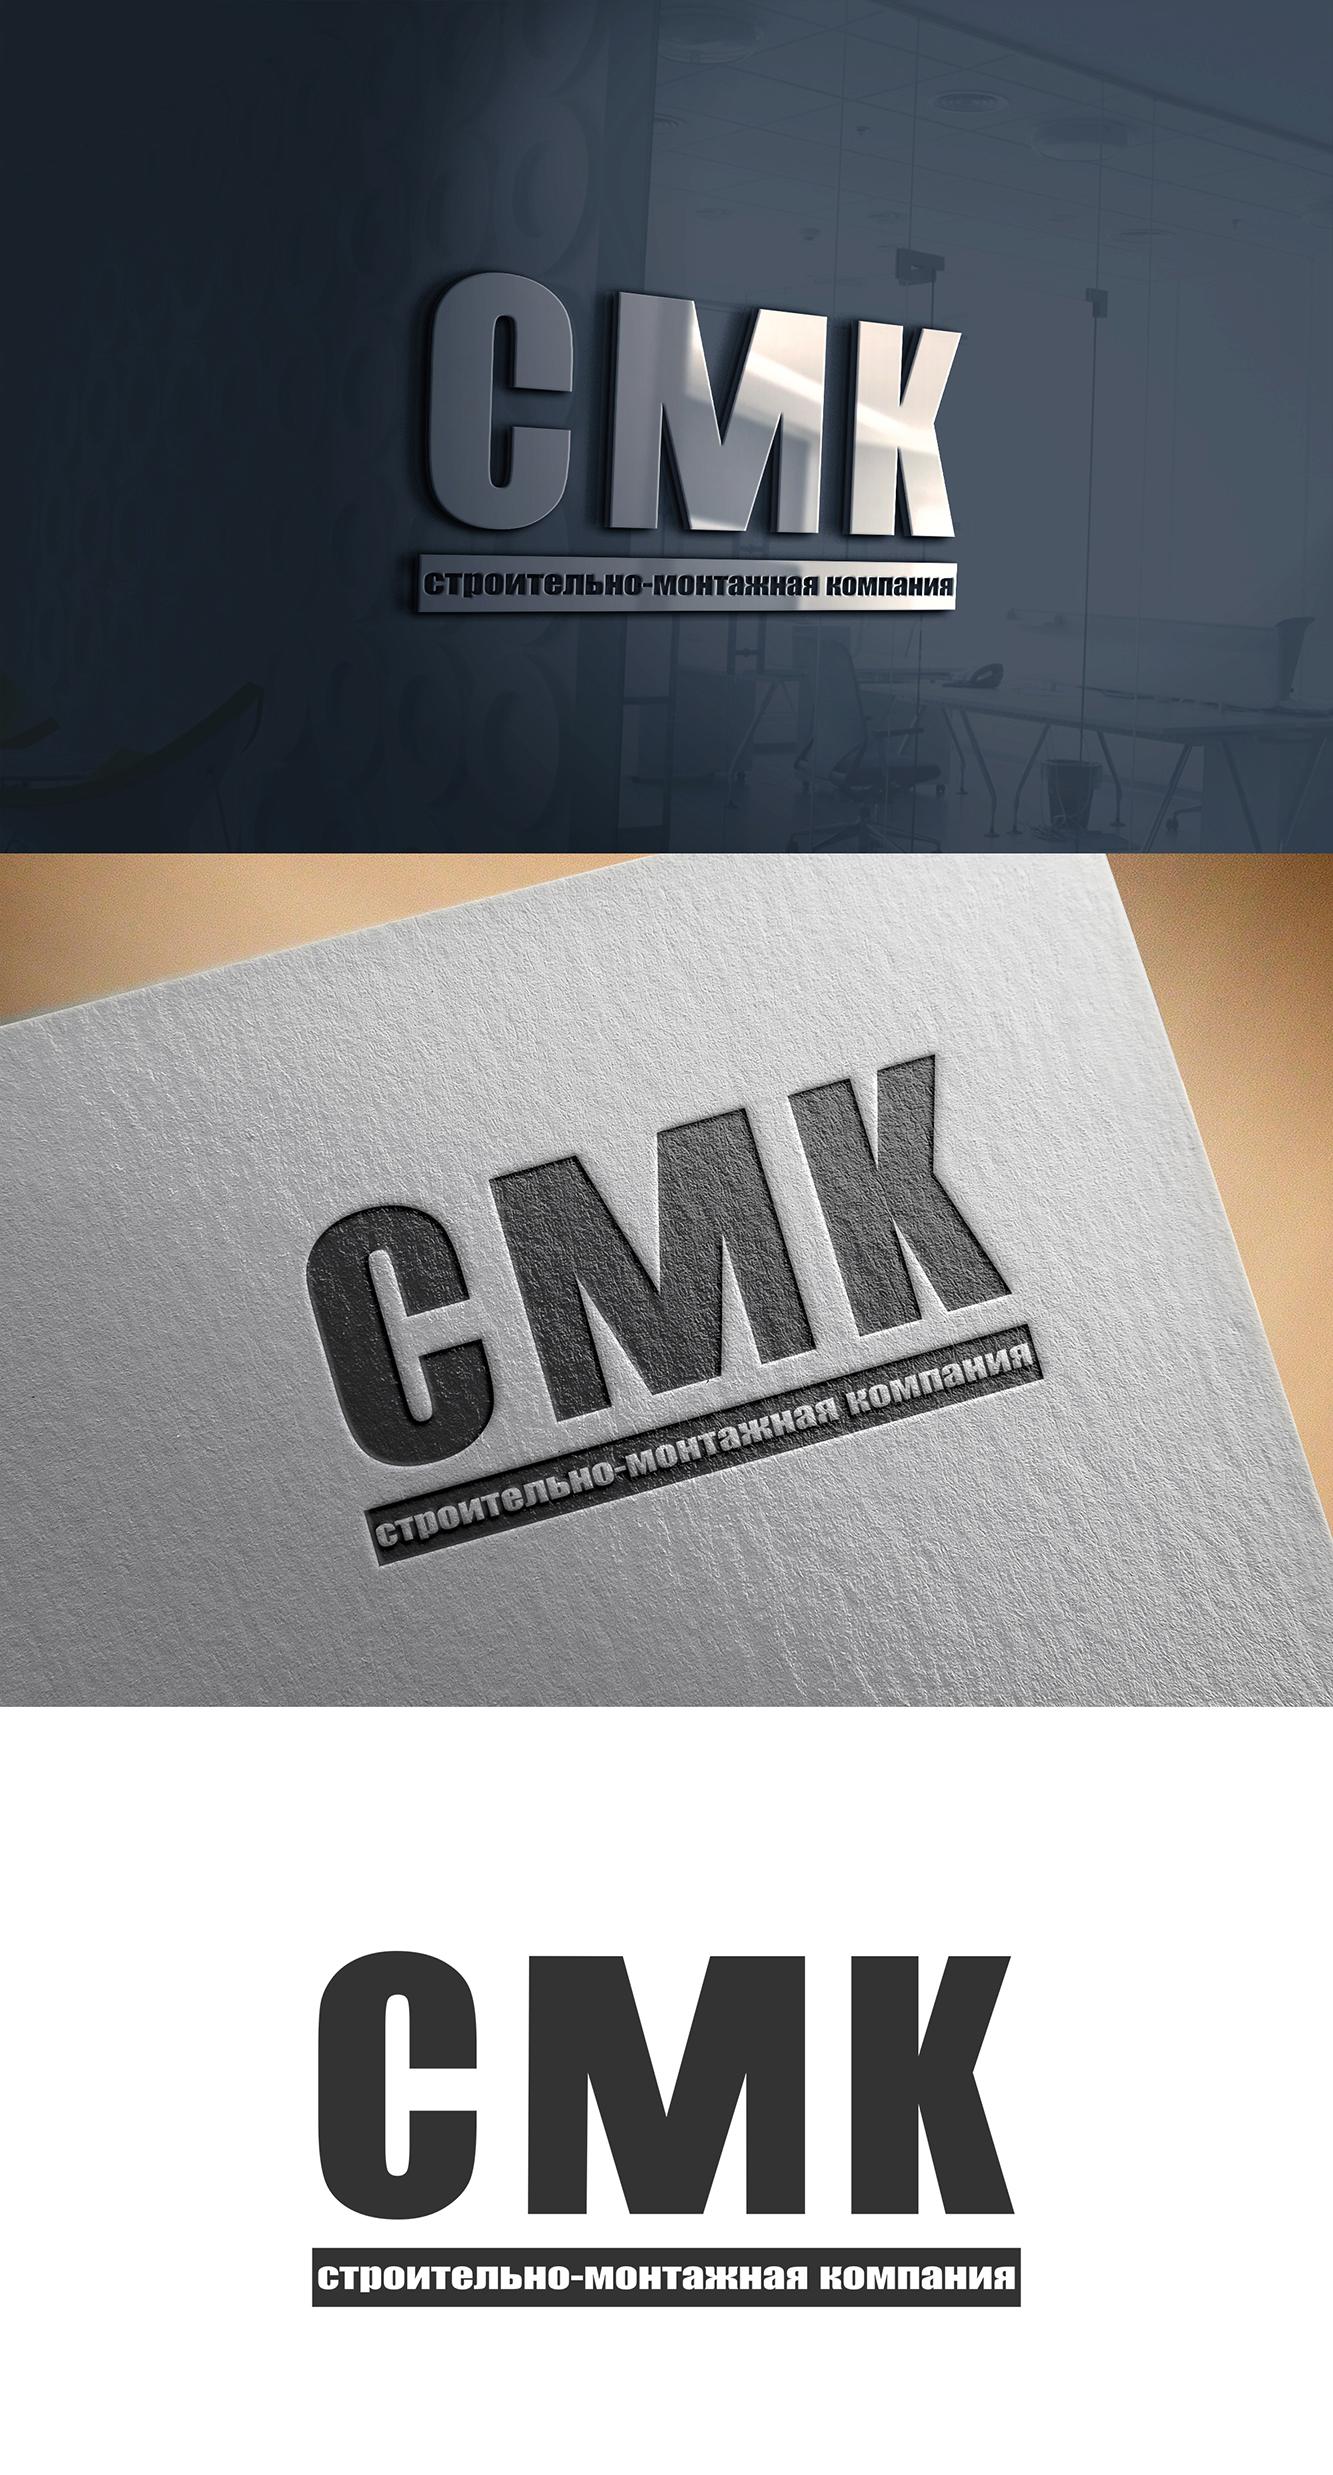 Разработка логотипа компании фото f_1235de426345c738.jpg